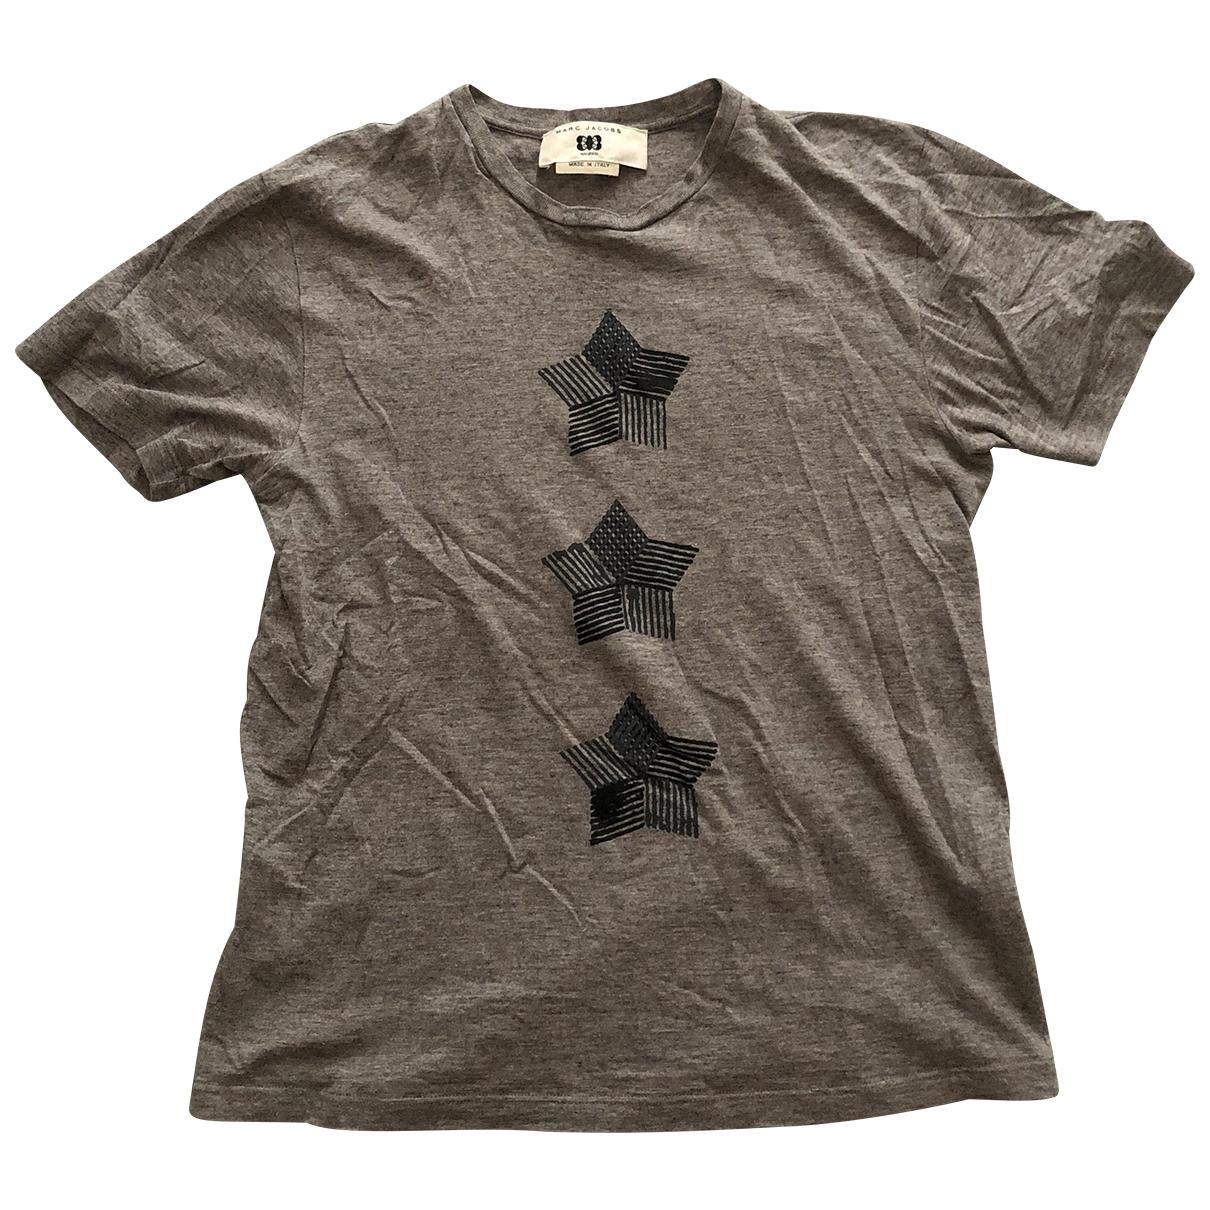 Marc Jacobs \N T-Shirts in  Grau Baumwolle